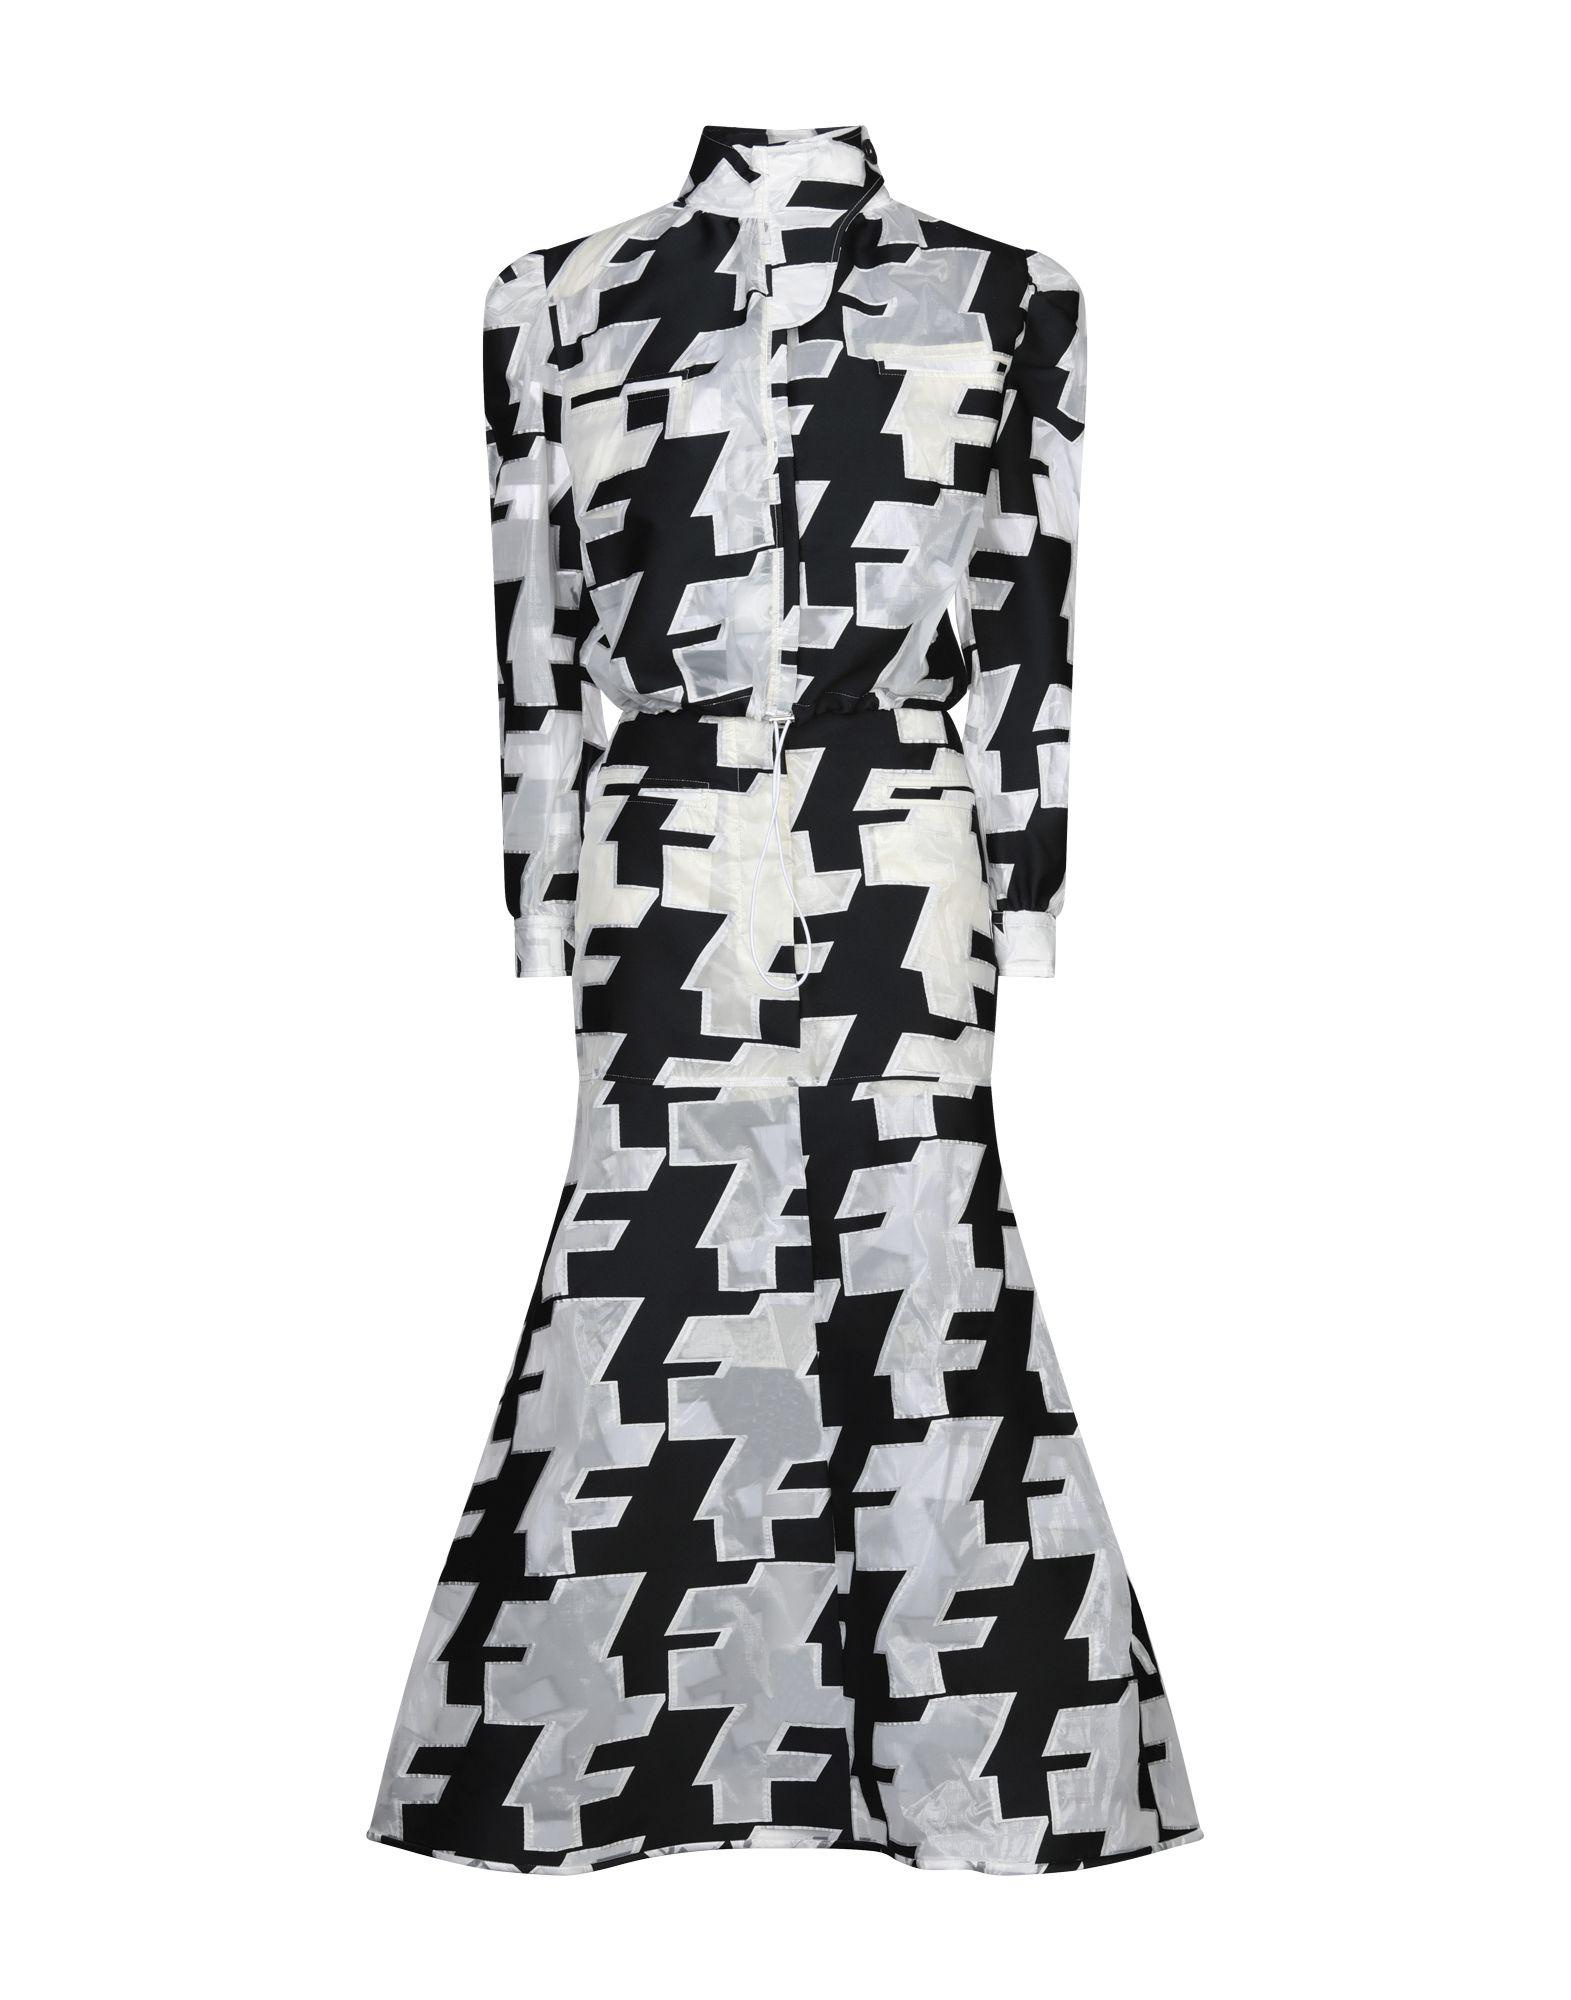 ANDREAS KRONTHALER x VIVIENNE WESTWOOD Длинное платье